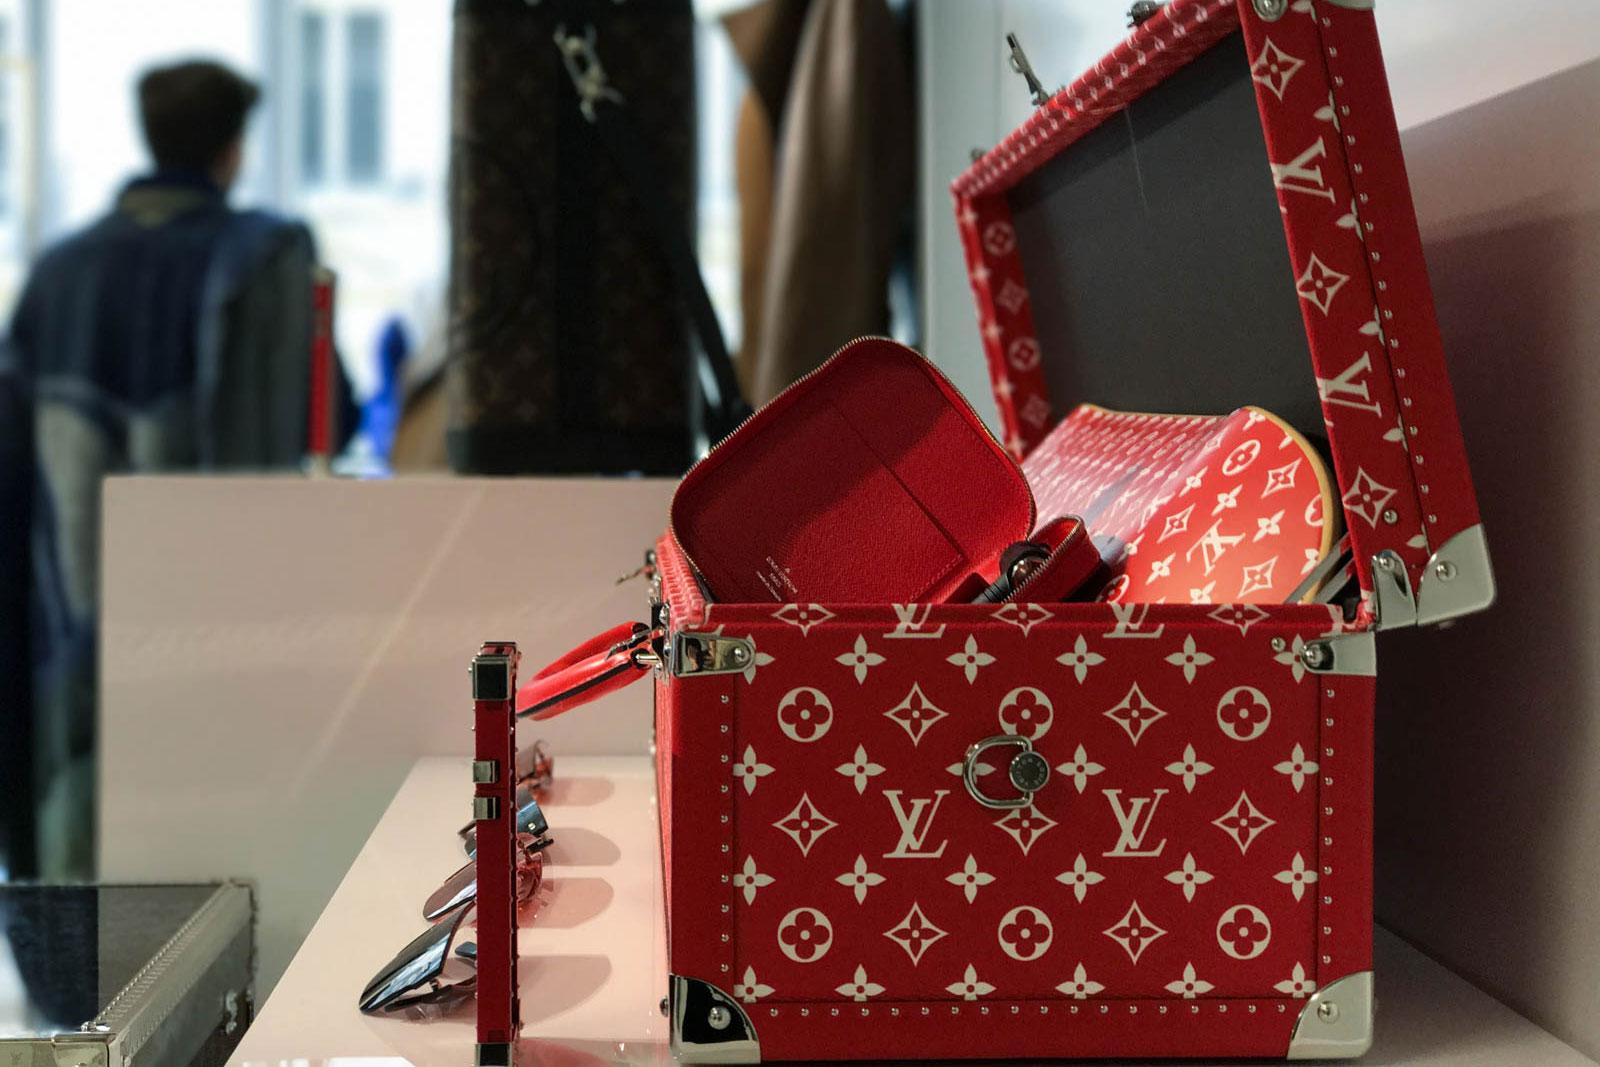 Supreme x Louis Vuitton 2017 Fall/Winter Closer Look Showroom - 3703561